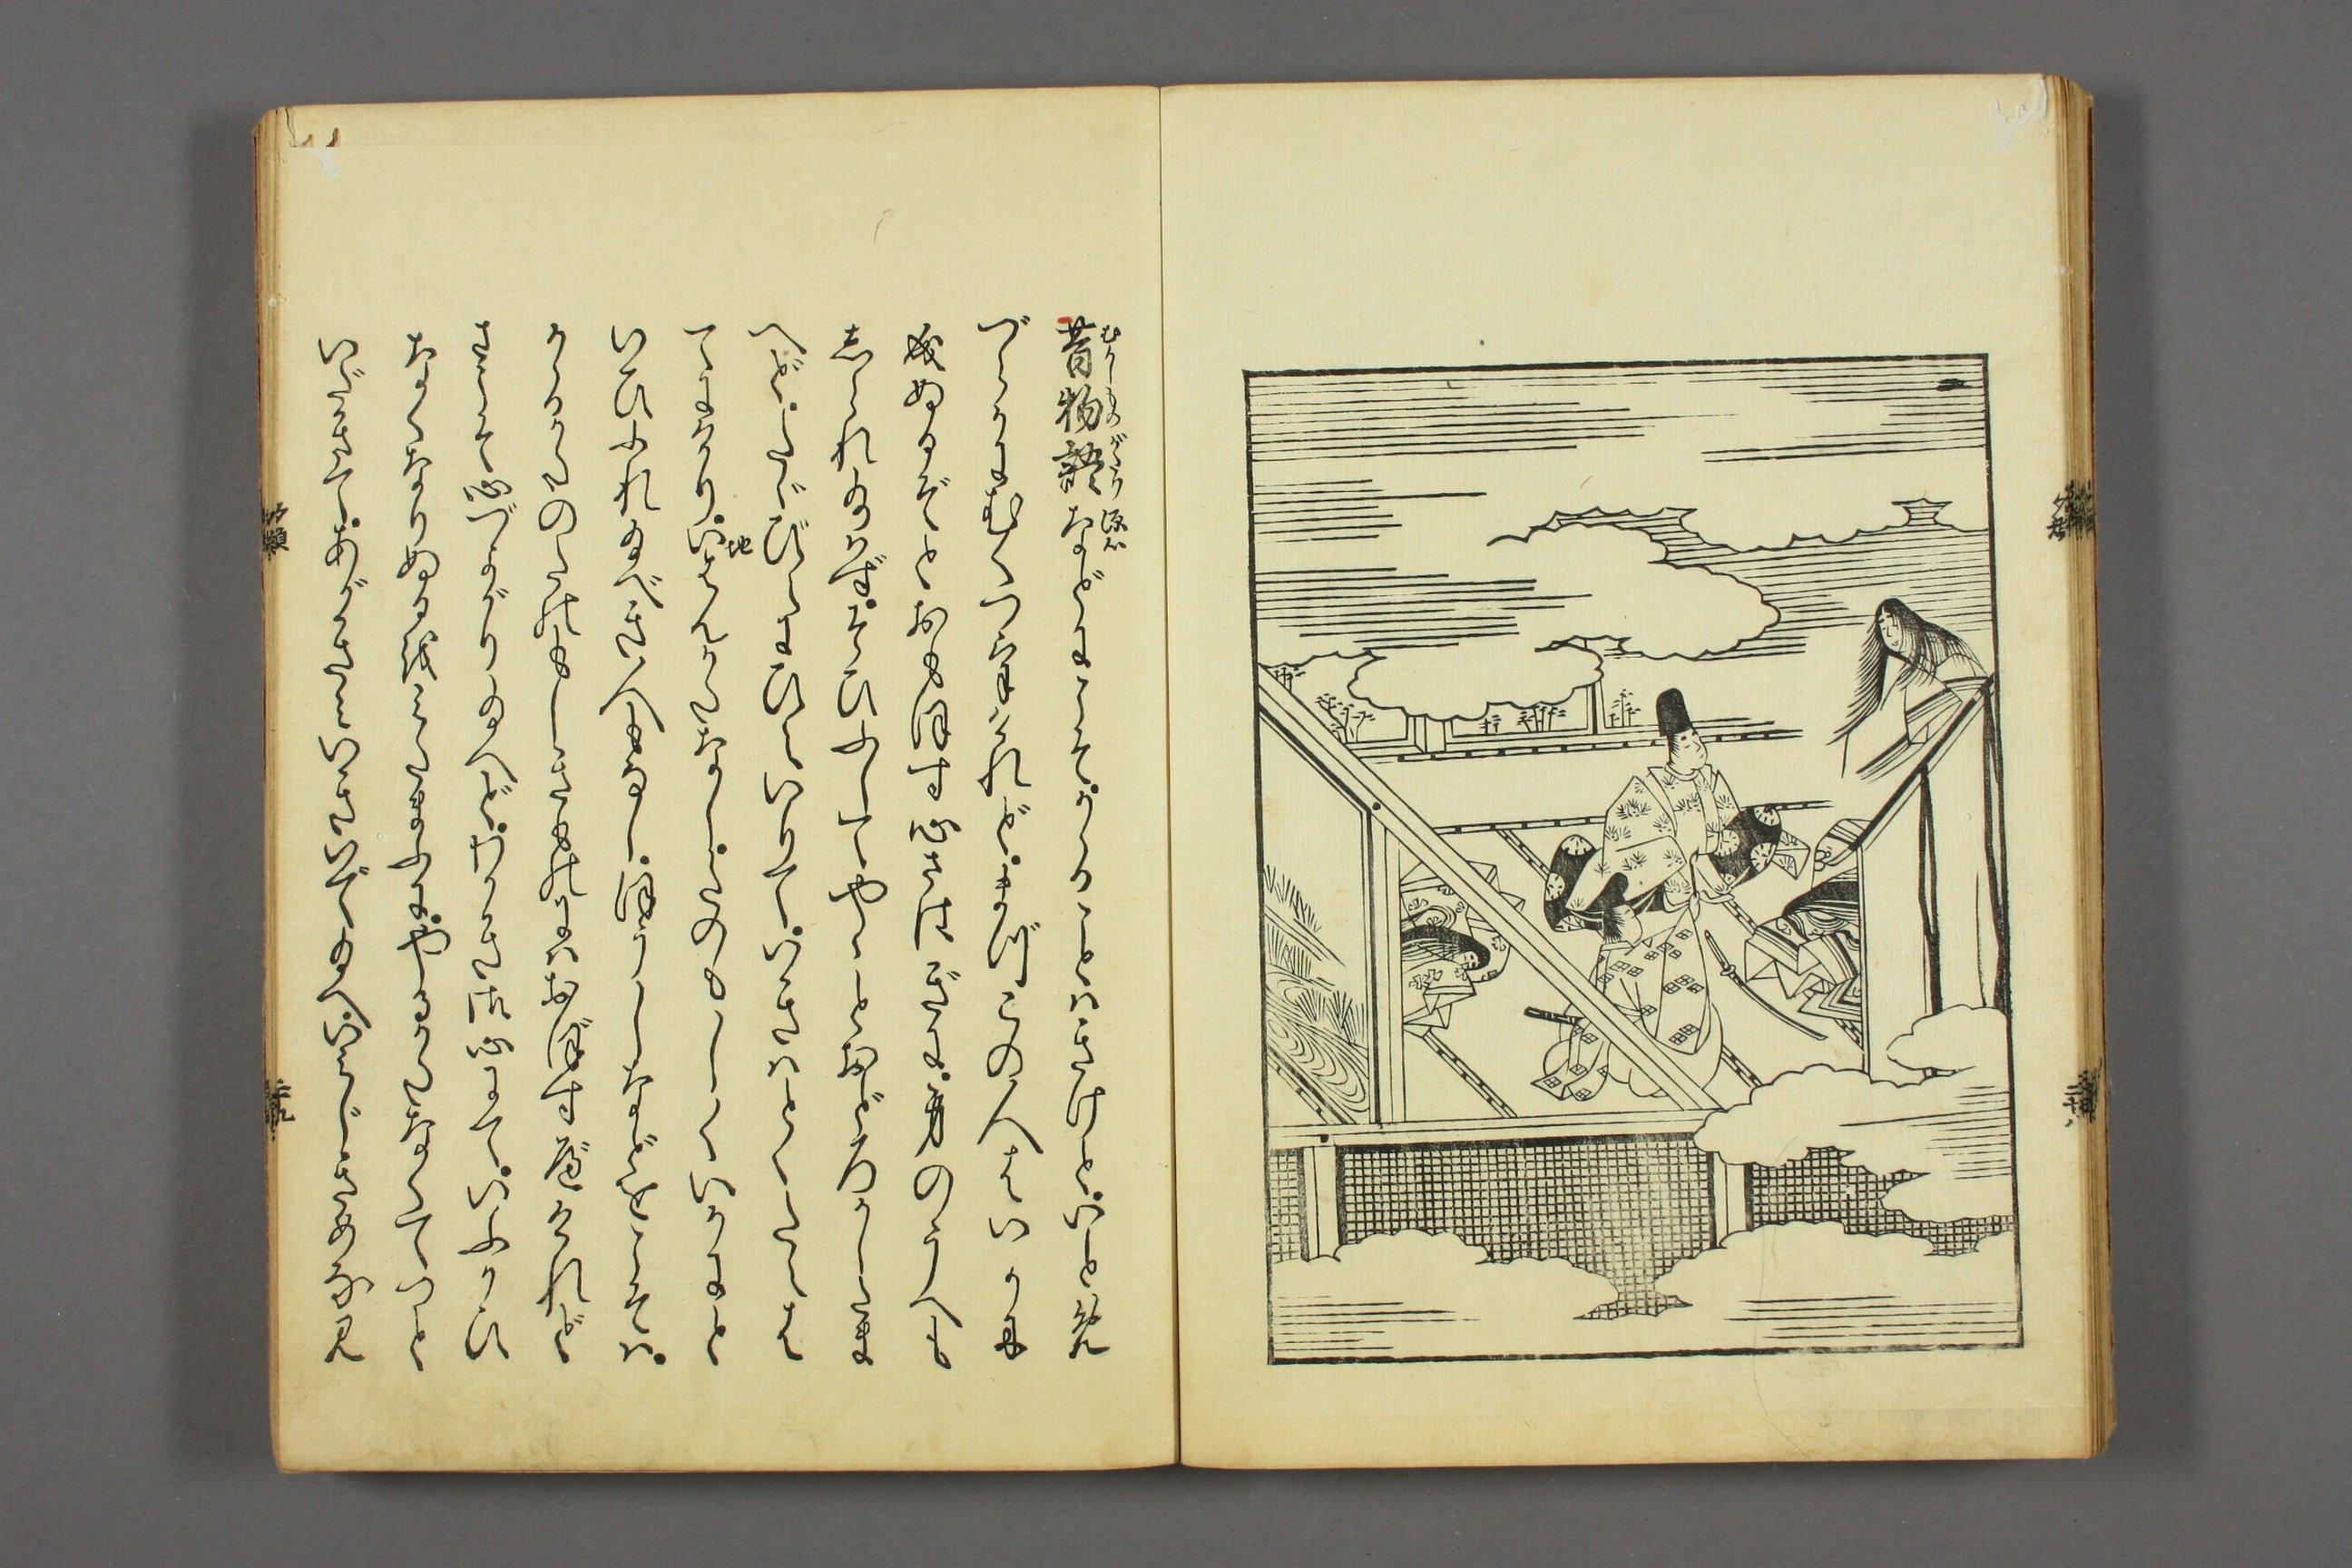 http://archive.wul.waseda.ac.jp/kosho/bunko30/bunko30_a0007/bunko30_a0007_0004/bunko30_a0007_0004_p0030.jpg